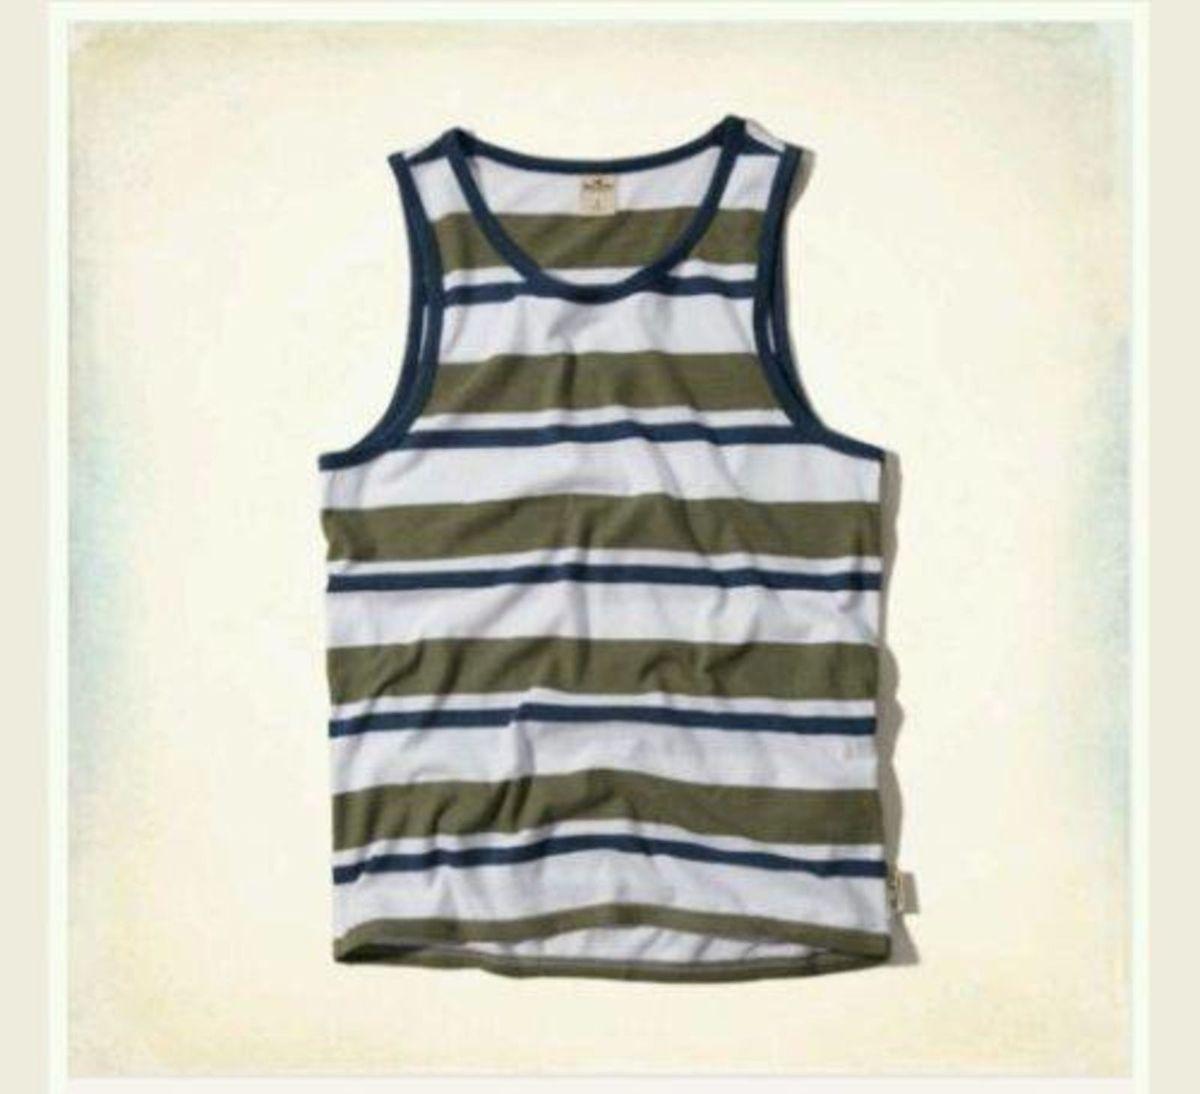 500d4a3613ca1 camiseta regata listrada hollister masculina original - camisetas hollister